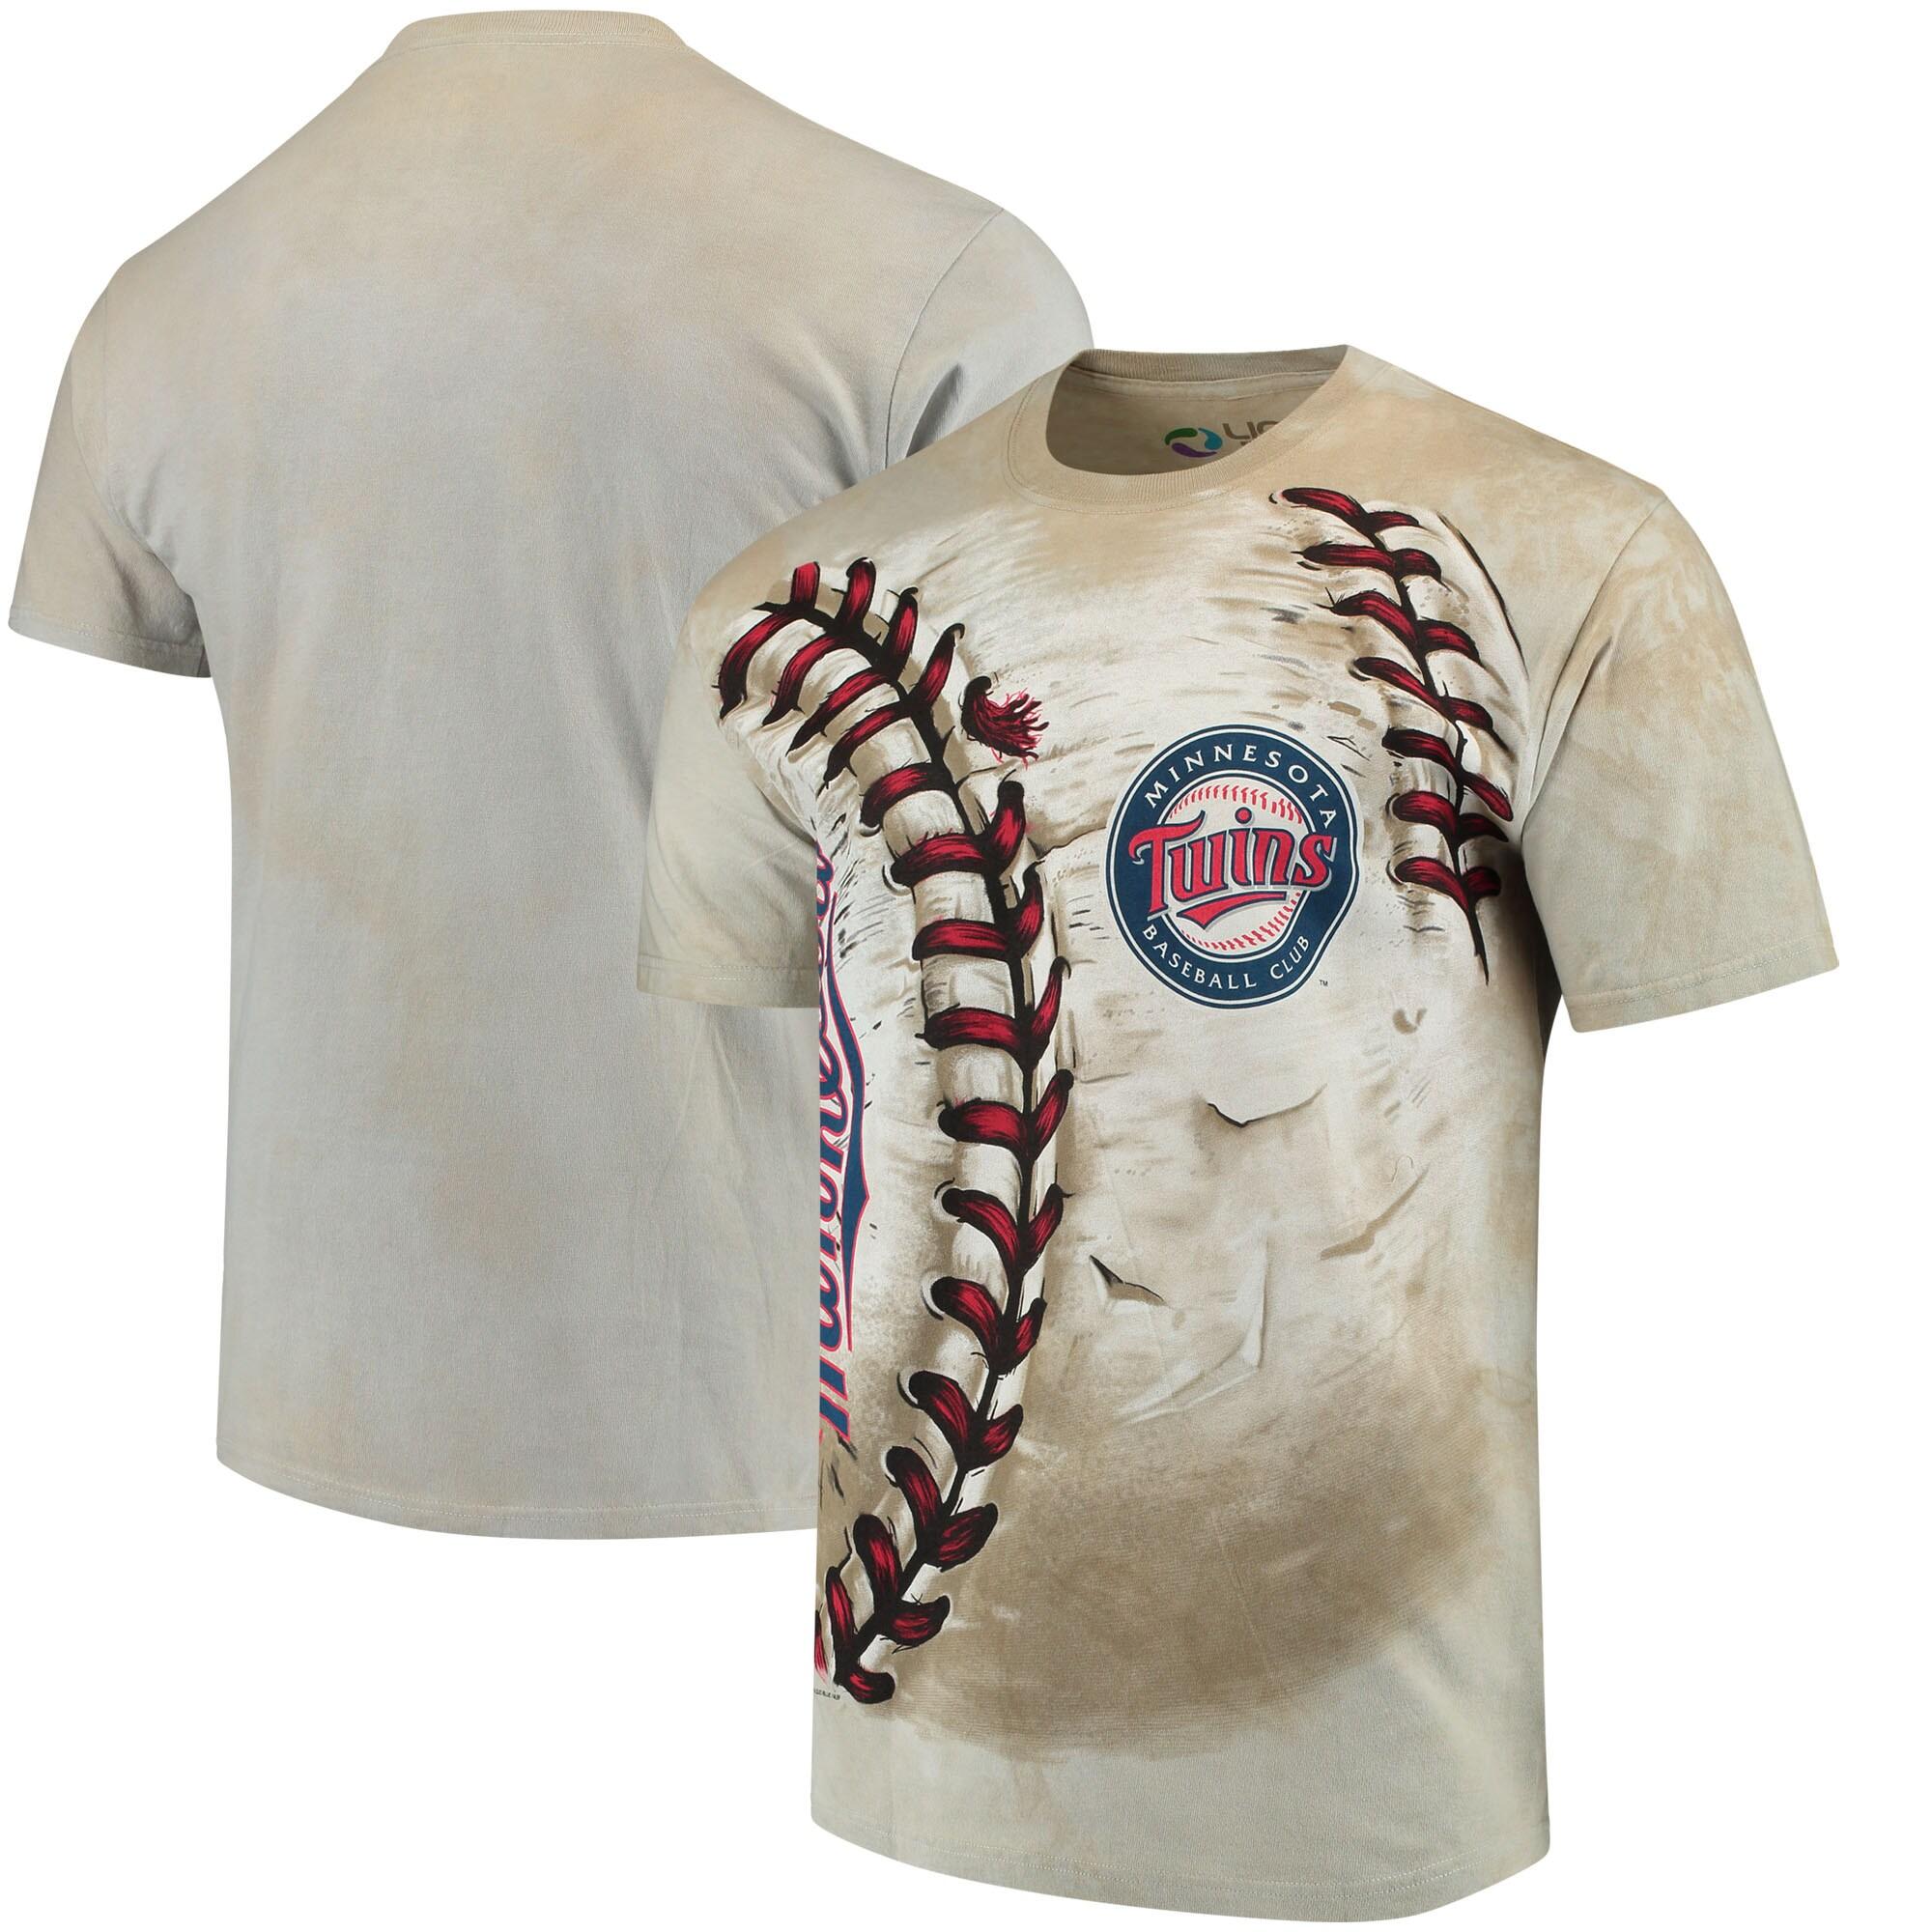 Minnesota Twins Hardball Tie-Dye T- Shirt - Cream